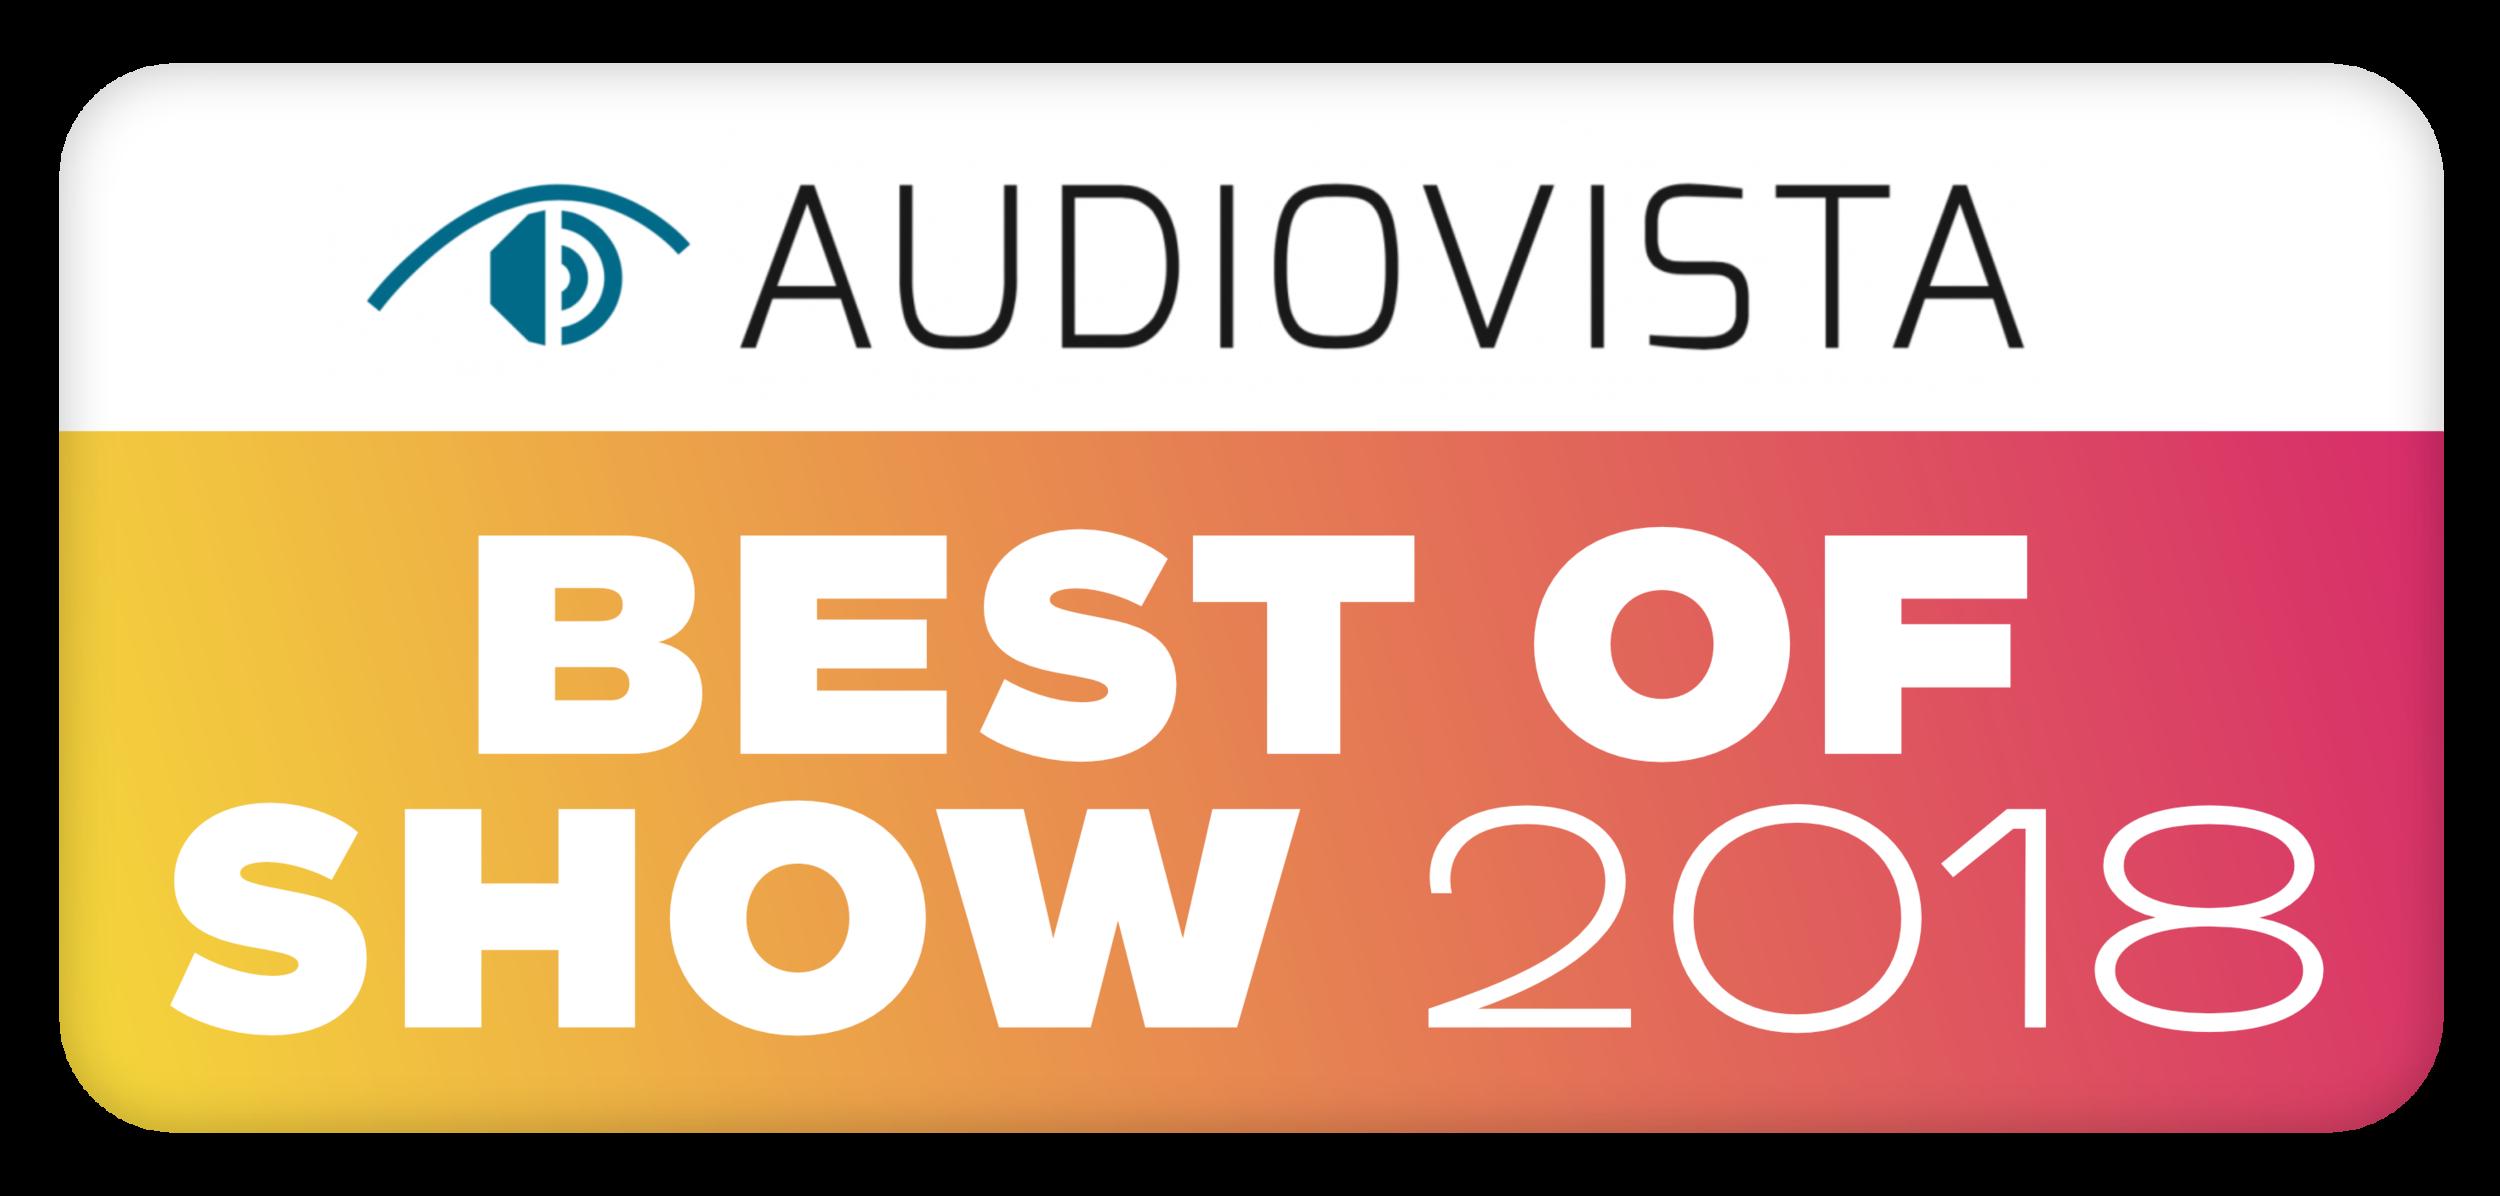 Best of Show 2018 - Audiovista_RGB.png